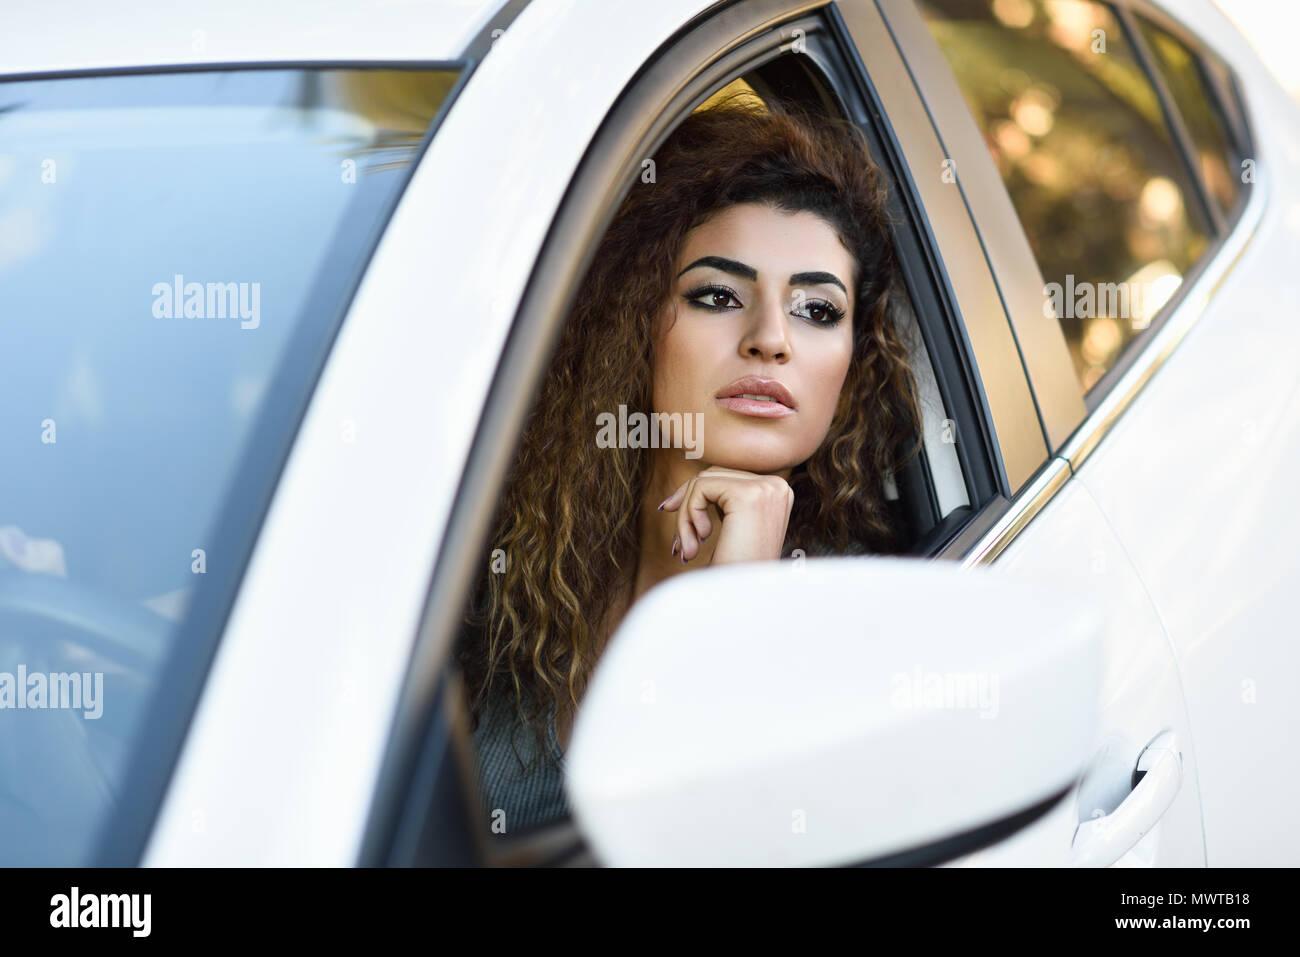 Arabic Girl 18